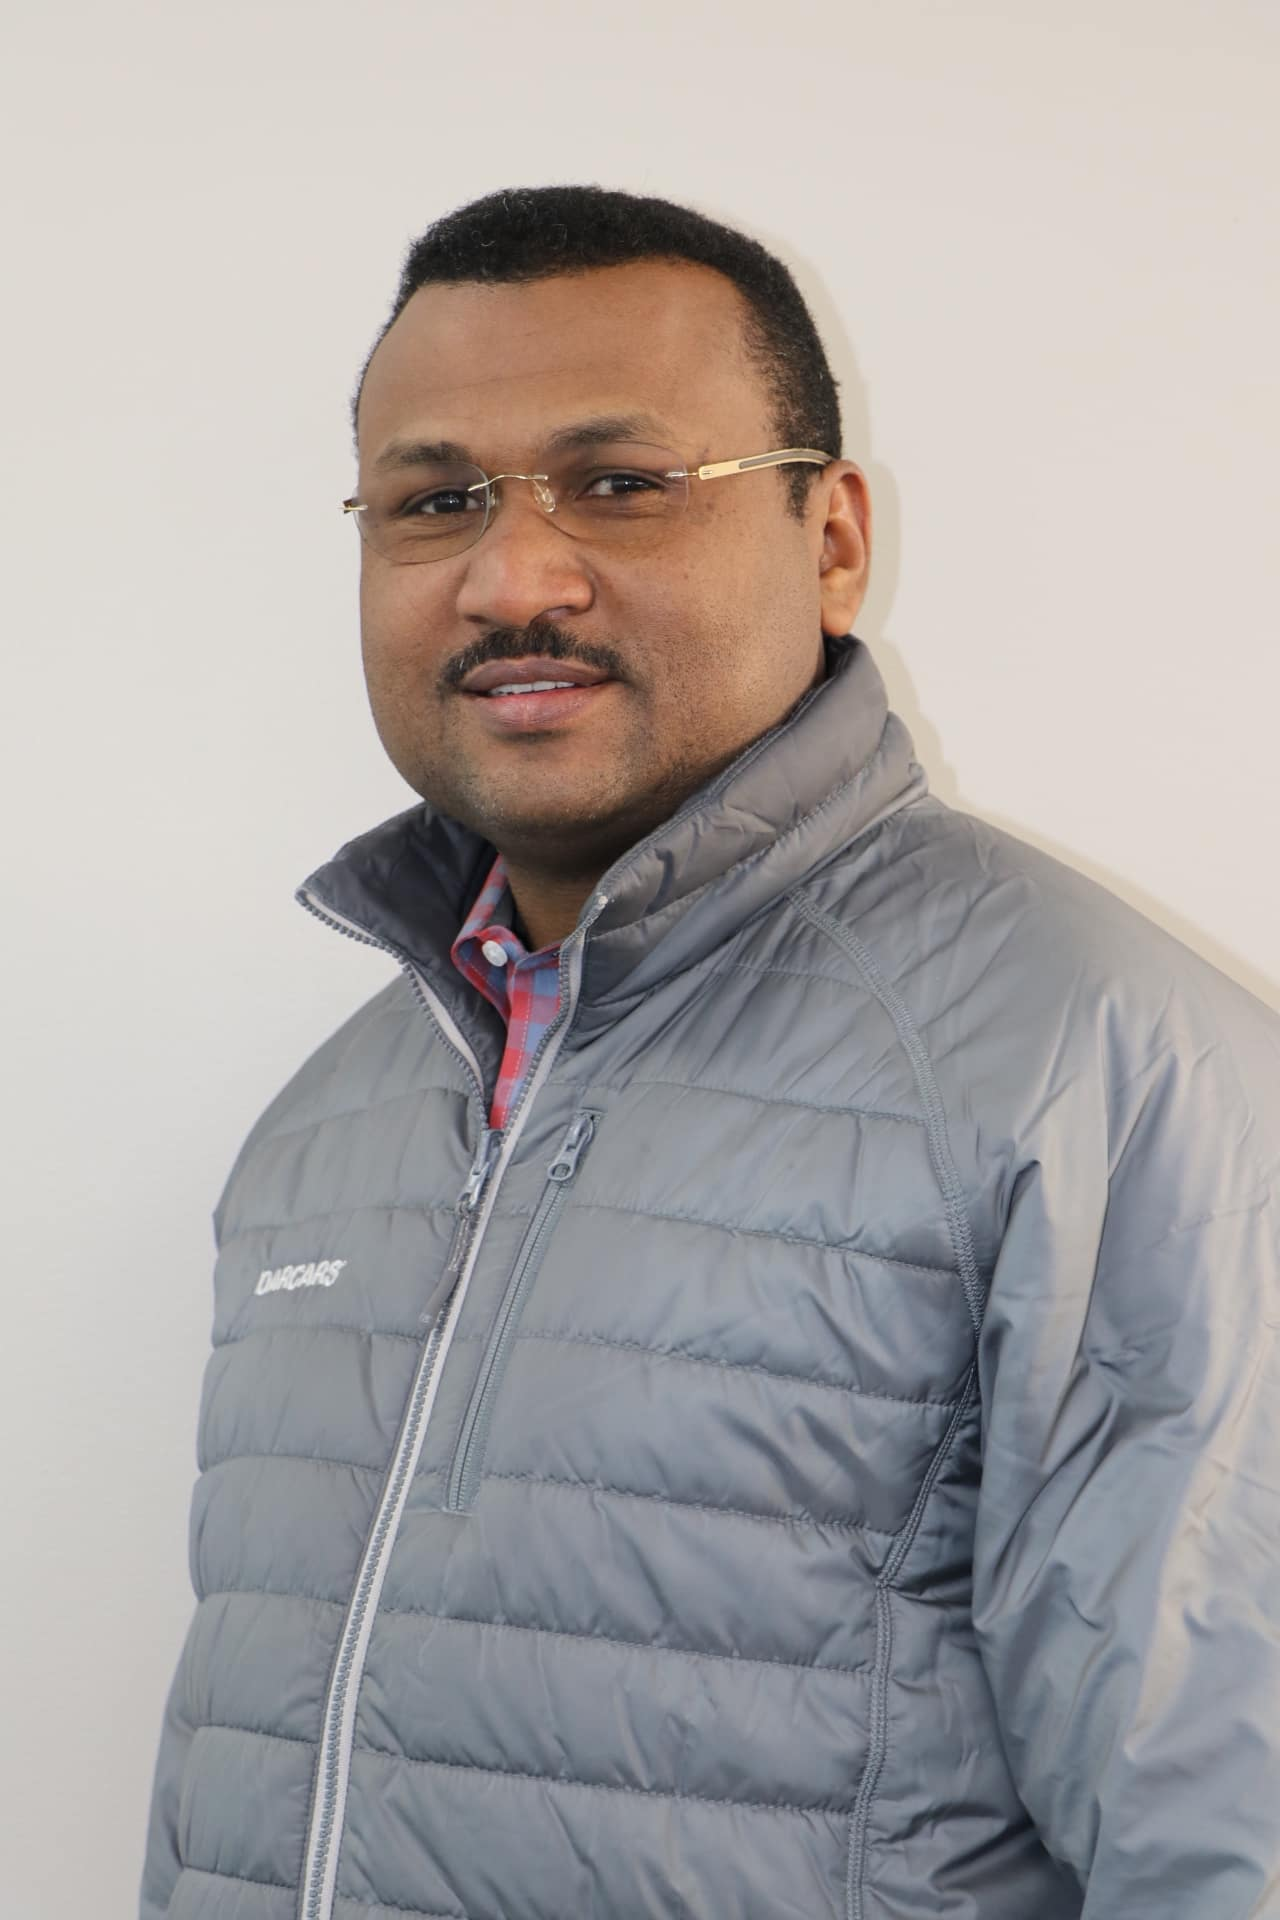 Mutaz Mohammed